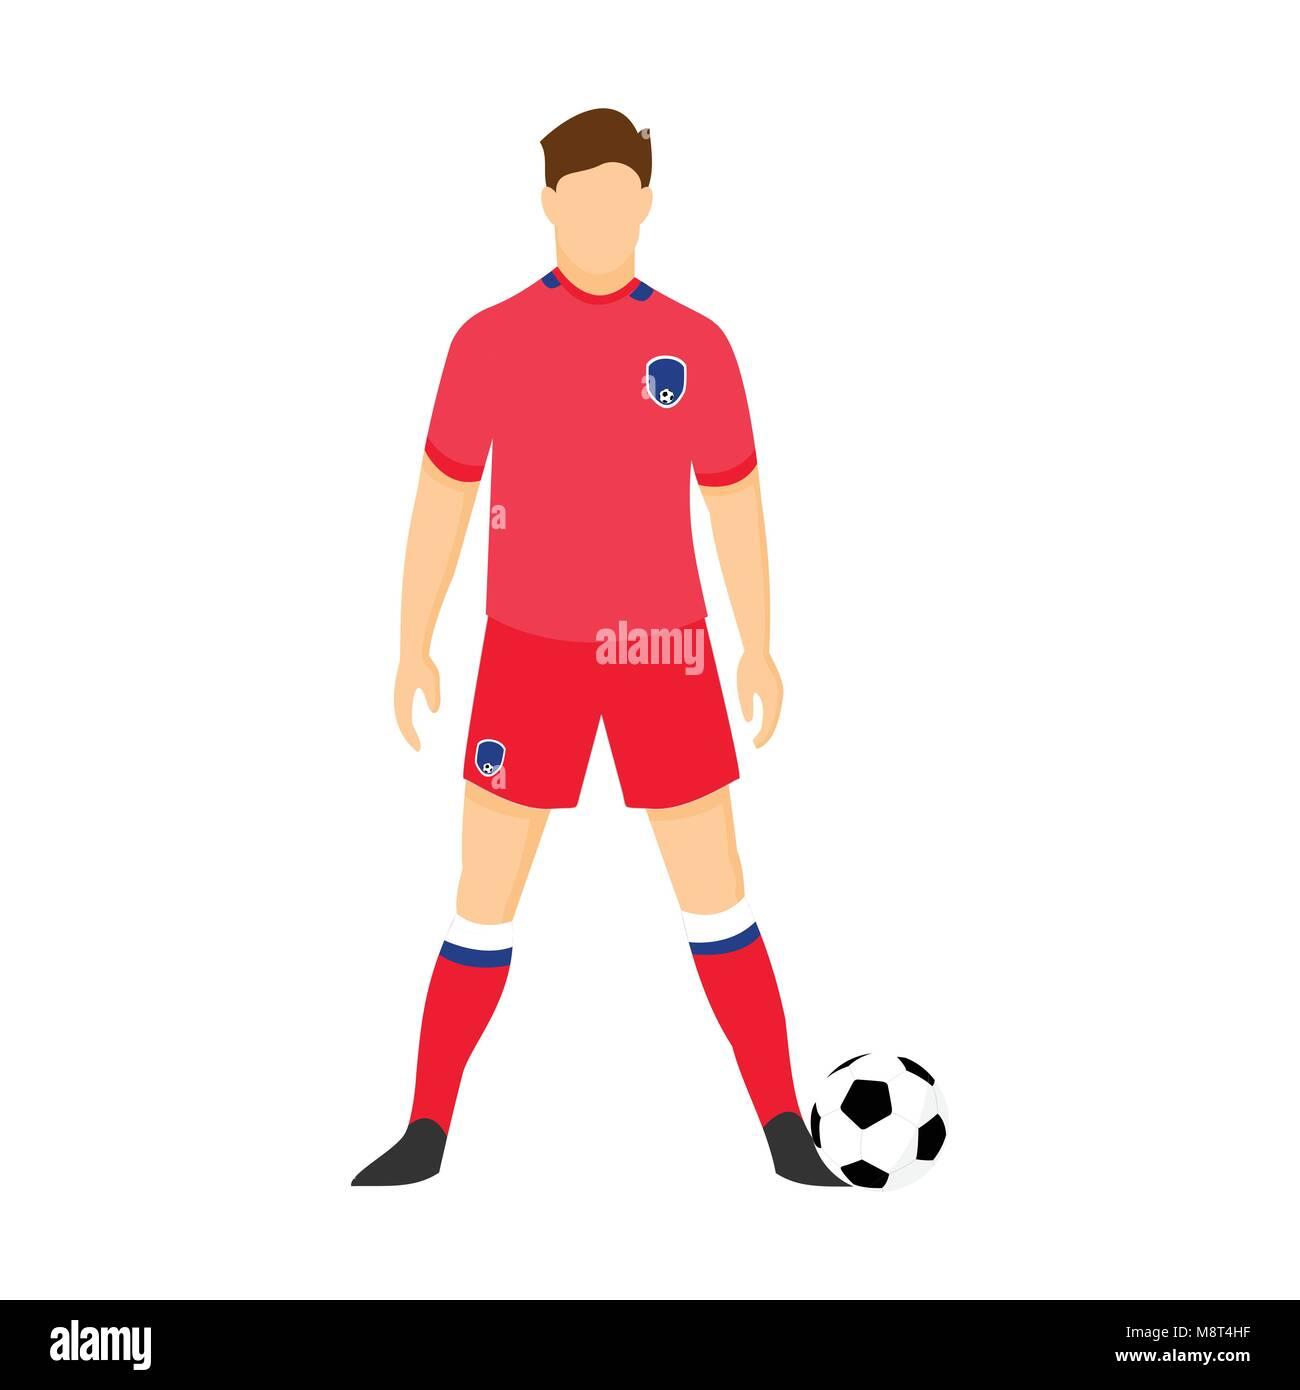 73225b5c72f South Korea Football Uniform National Team Vector Illustration Graphic  Design - Stock Vector